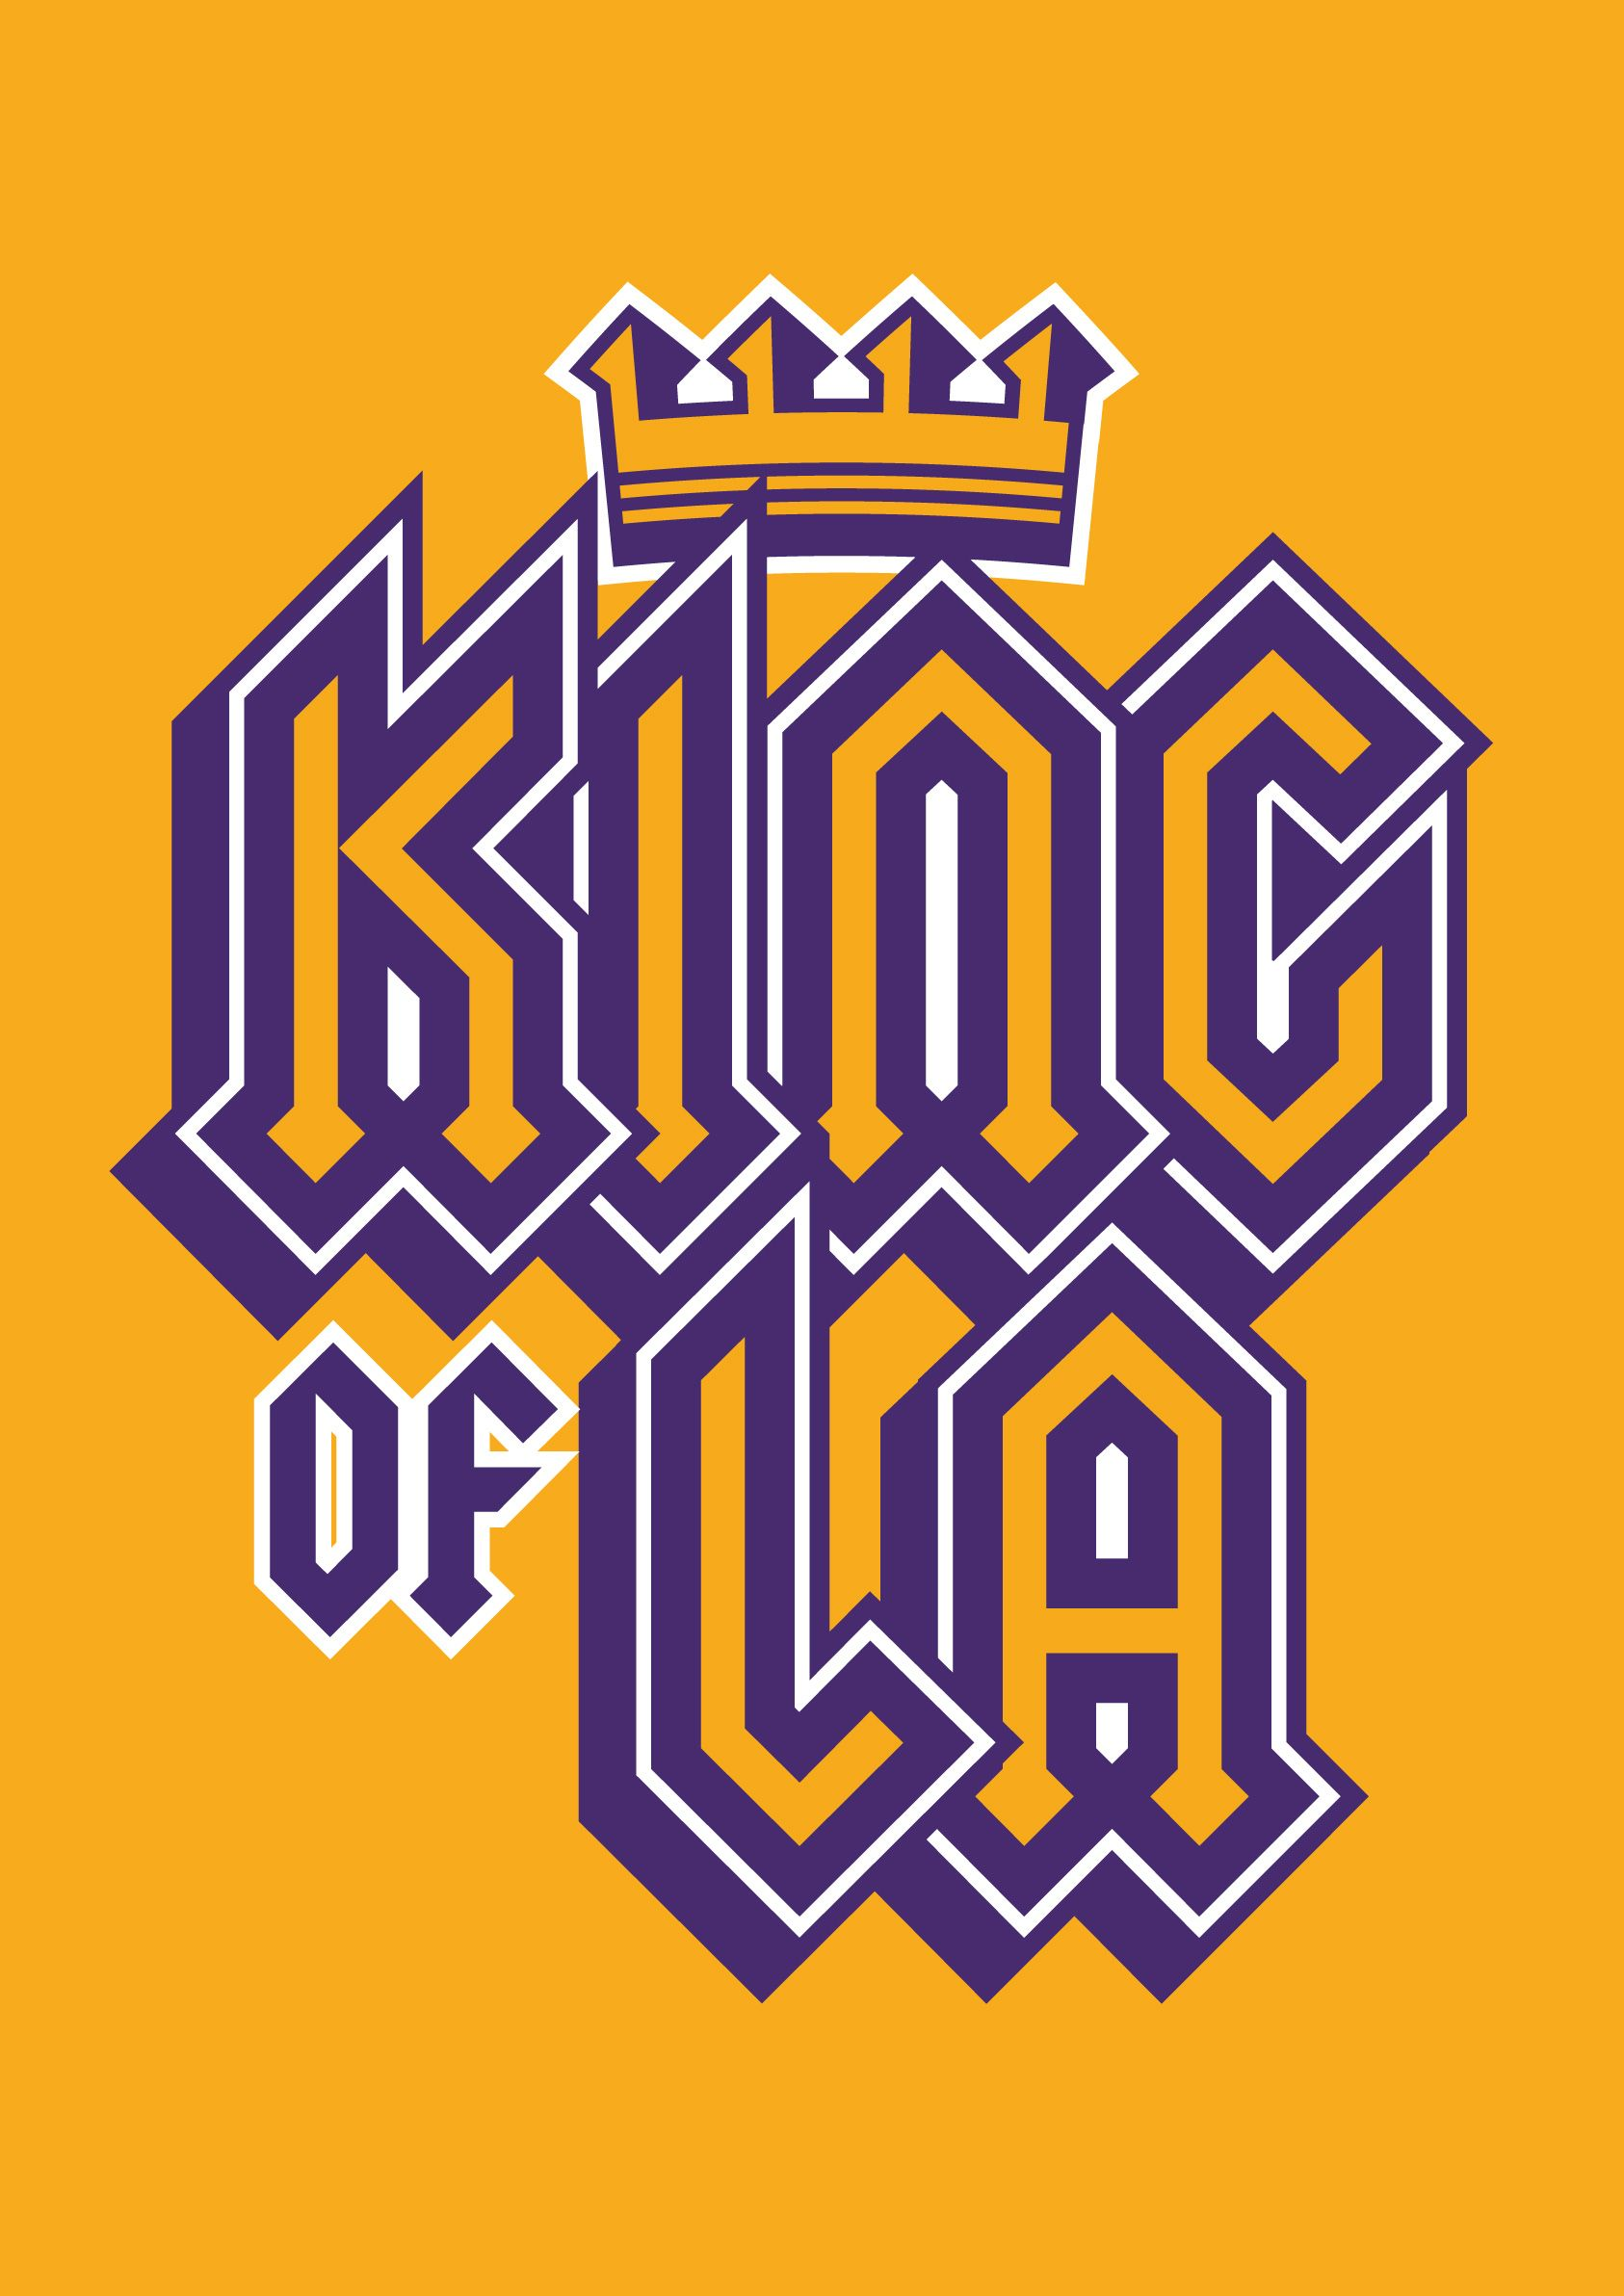 King of LA minimal downloadable wall art print/poster by Robot Eats ...